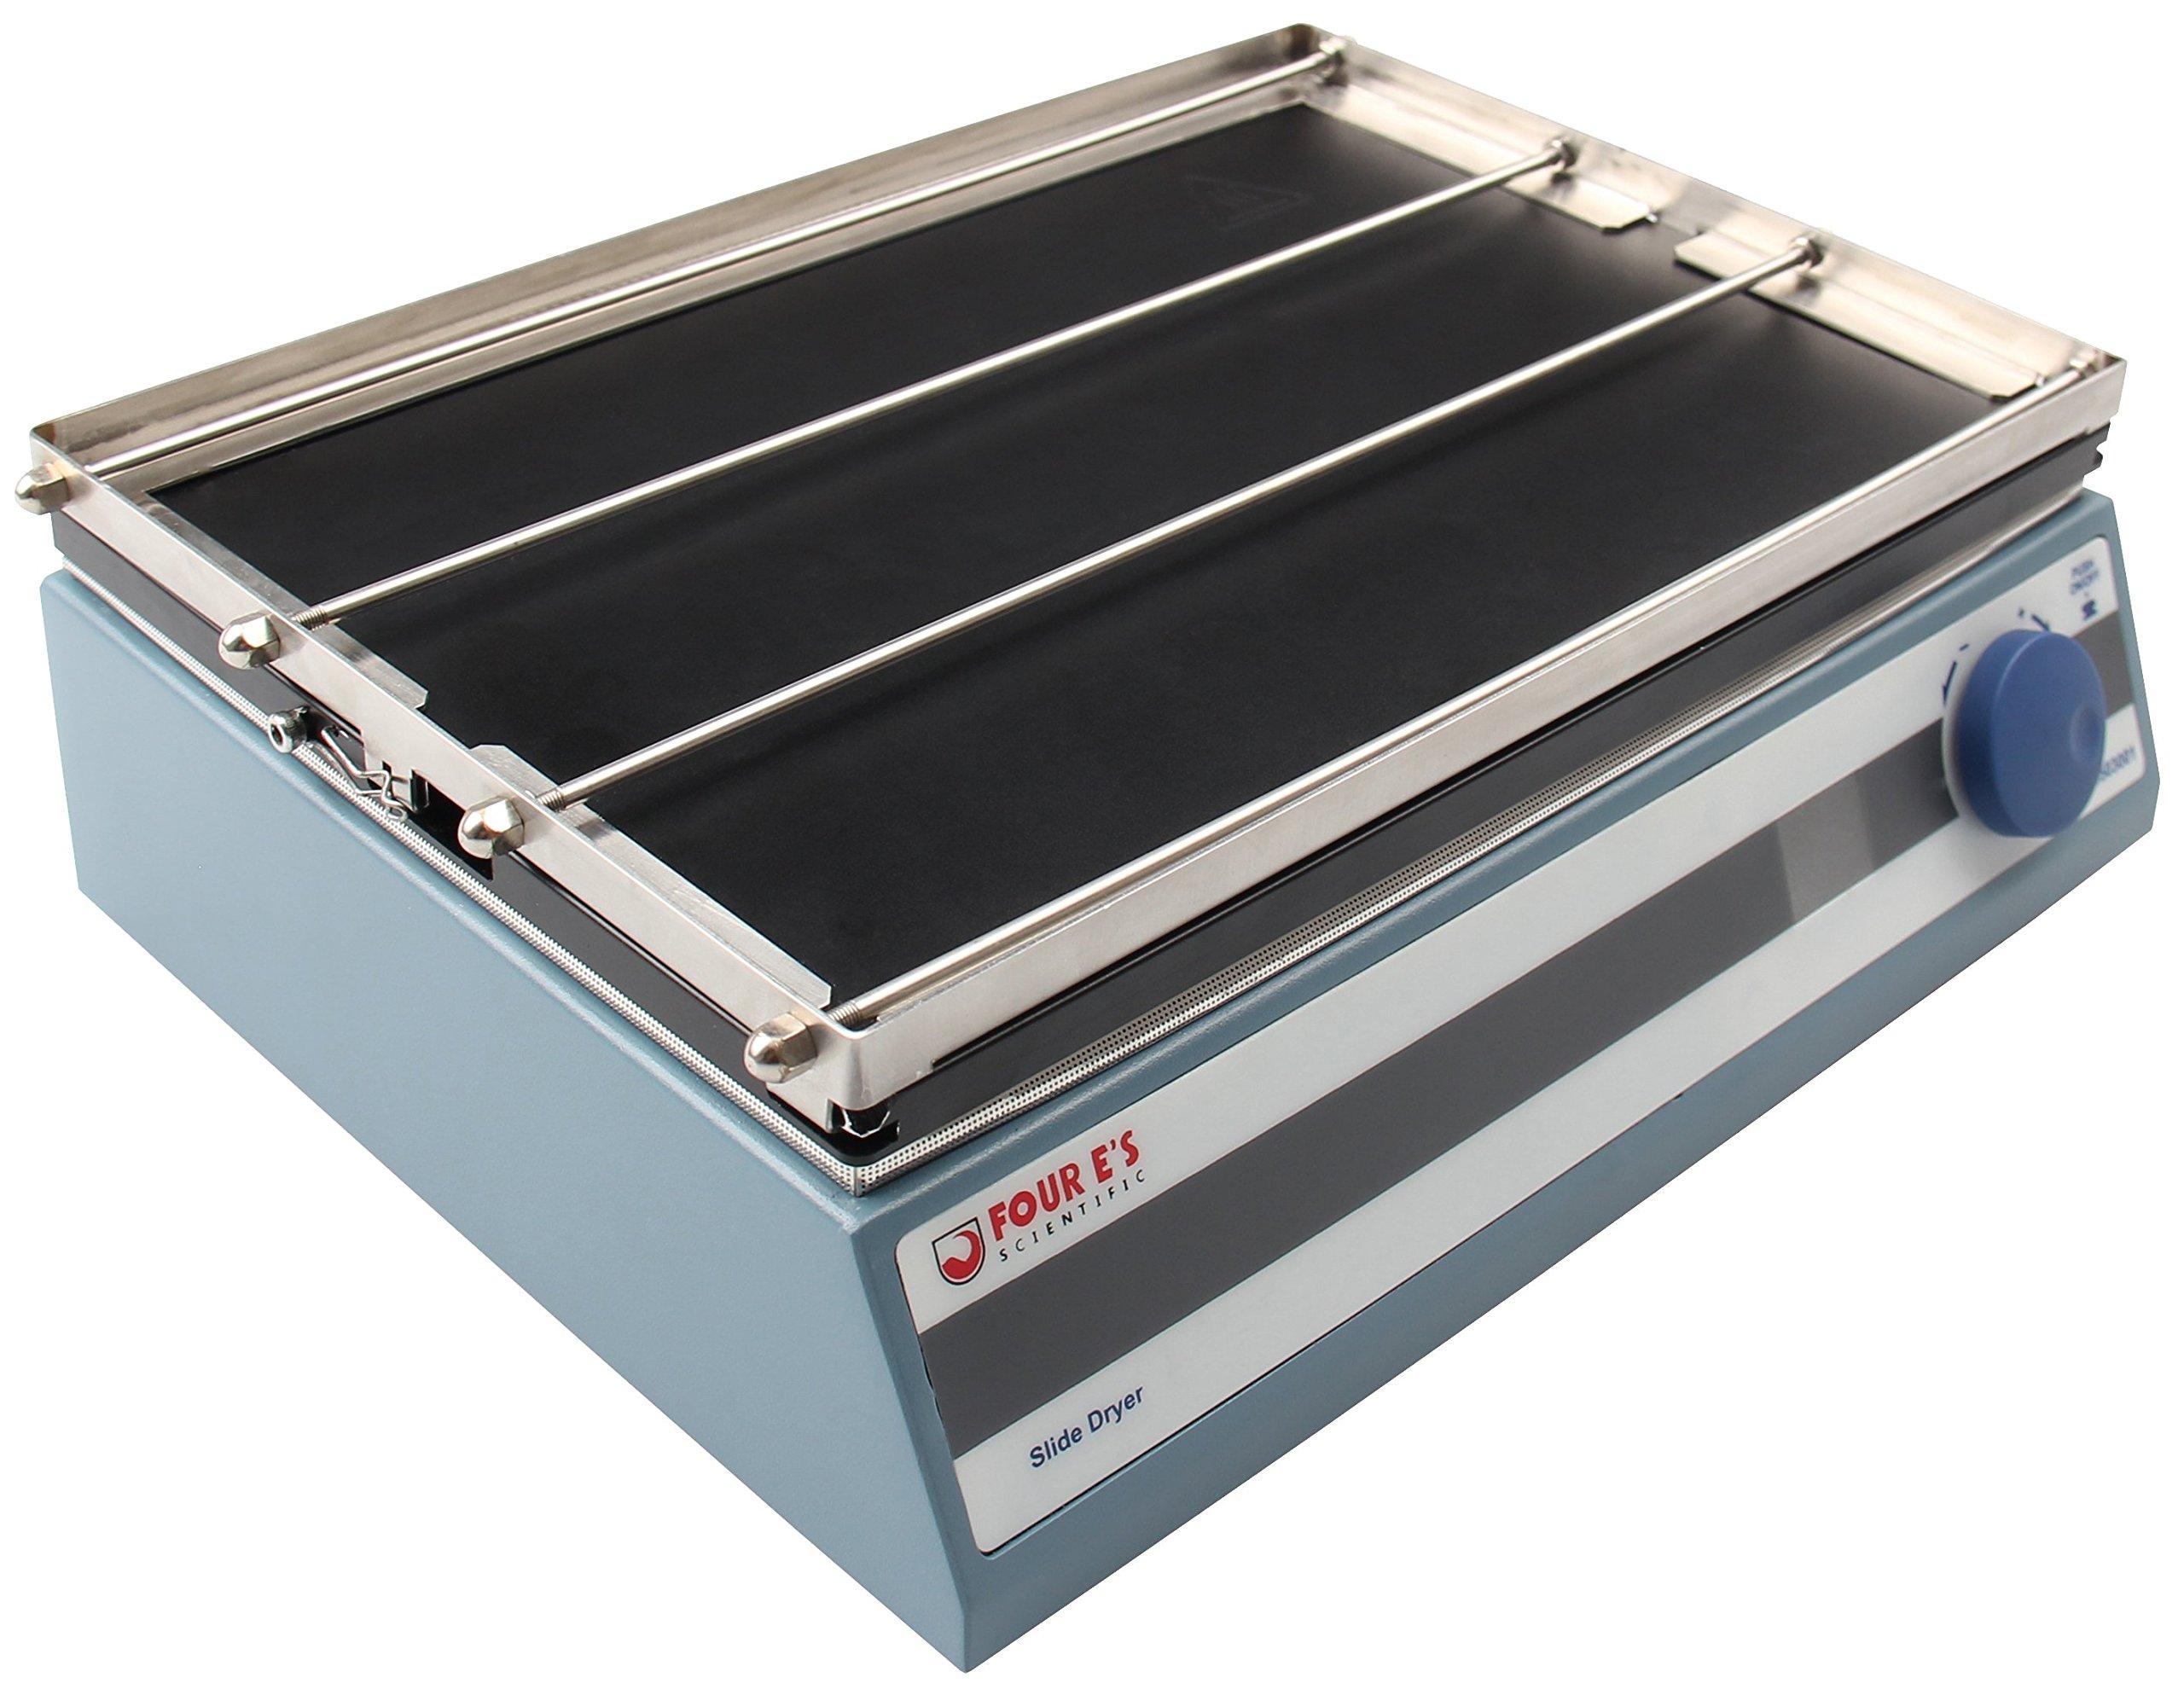 Four E's Scientific LED display 250W 50Hz Slide Dryer